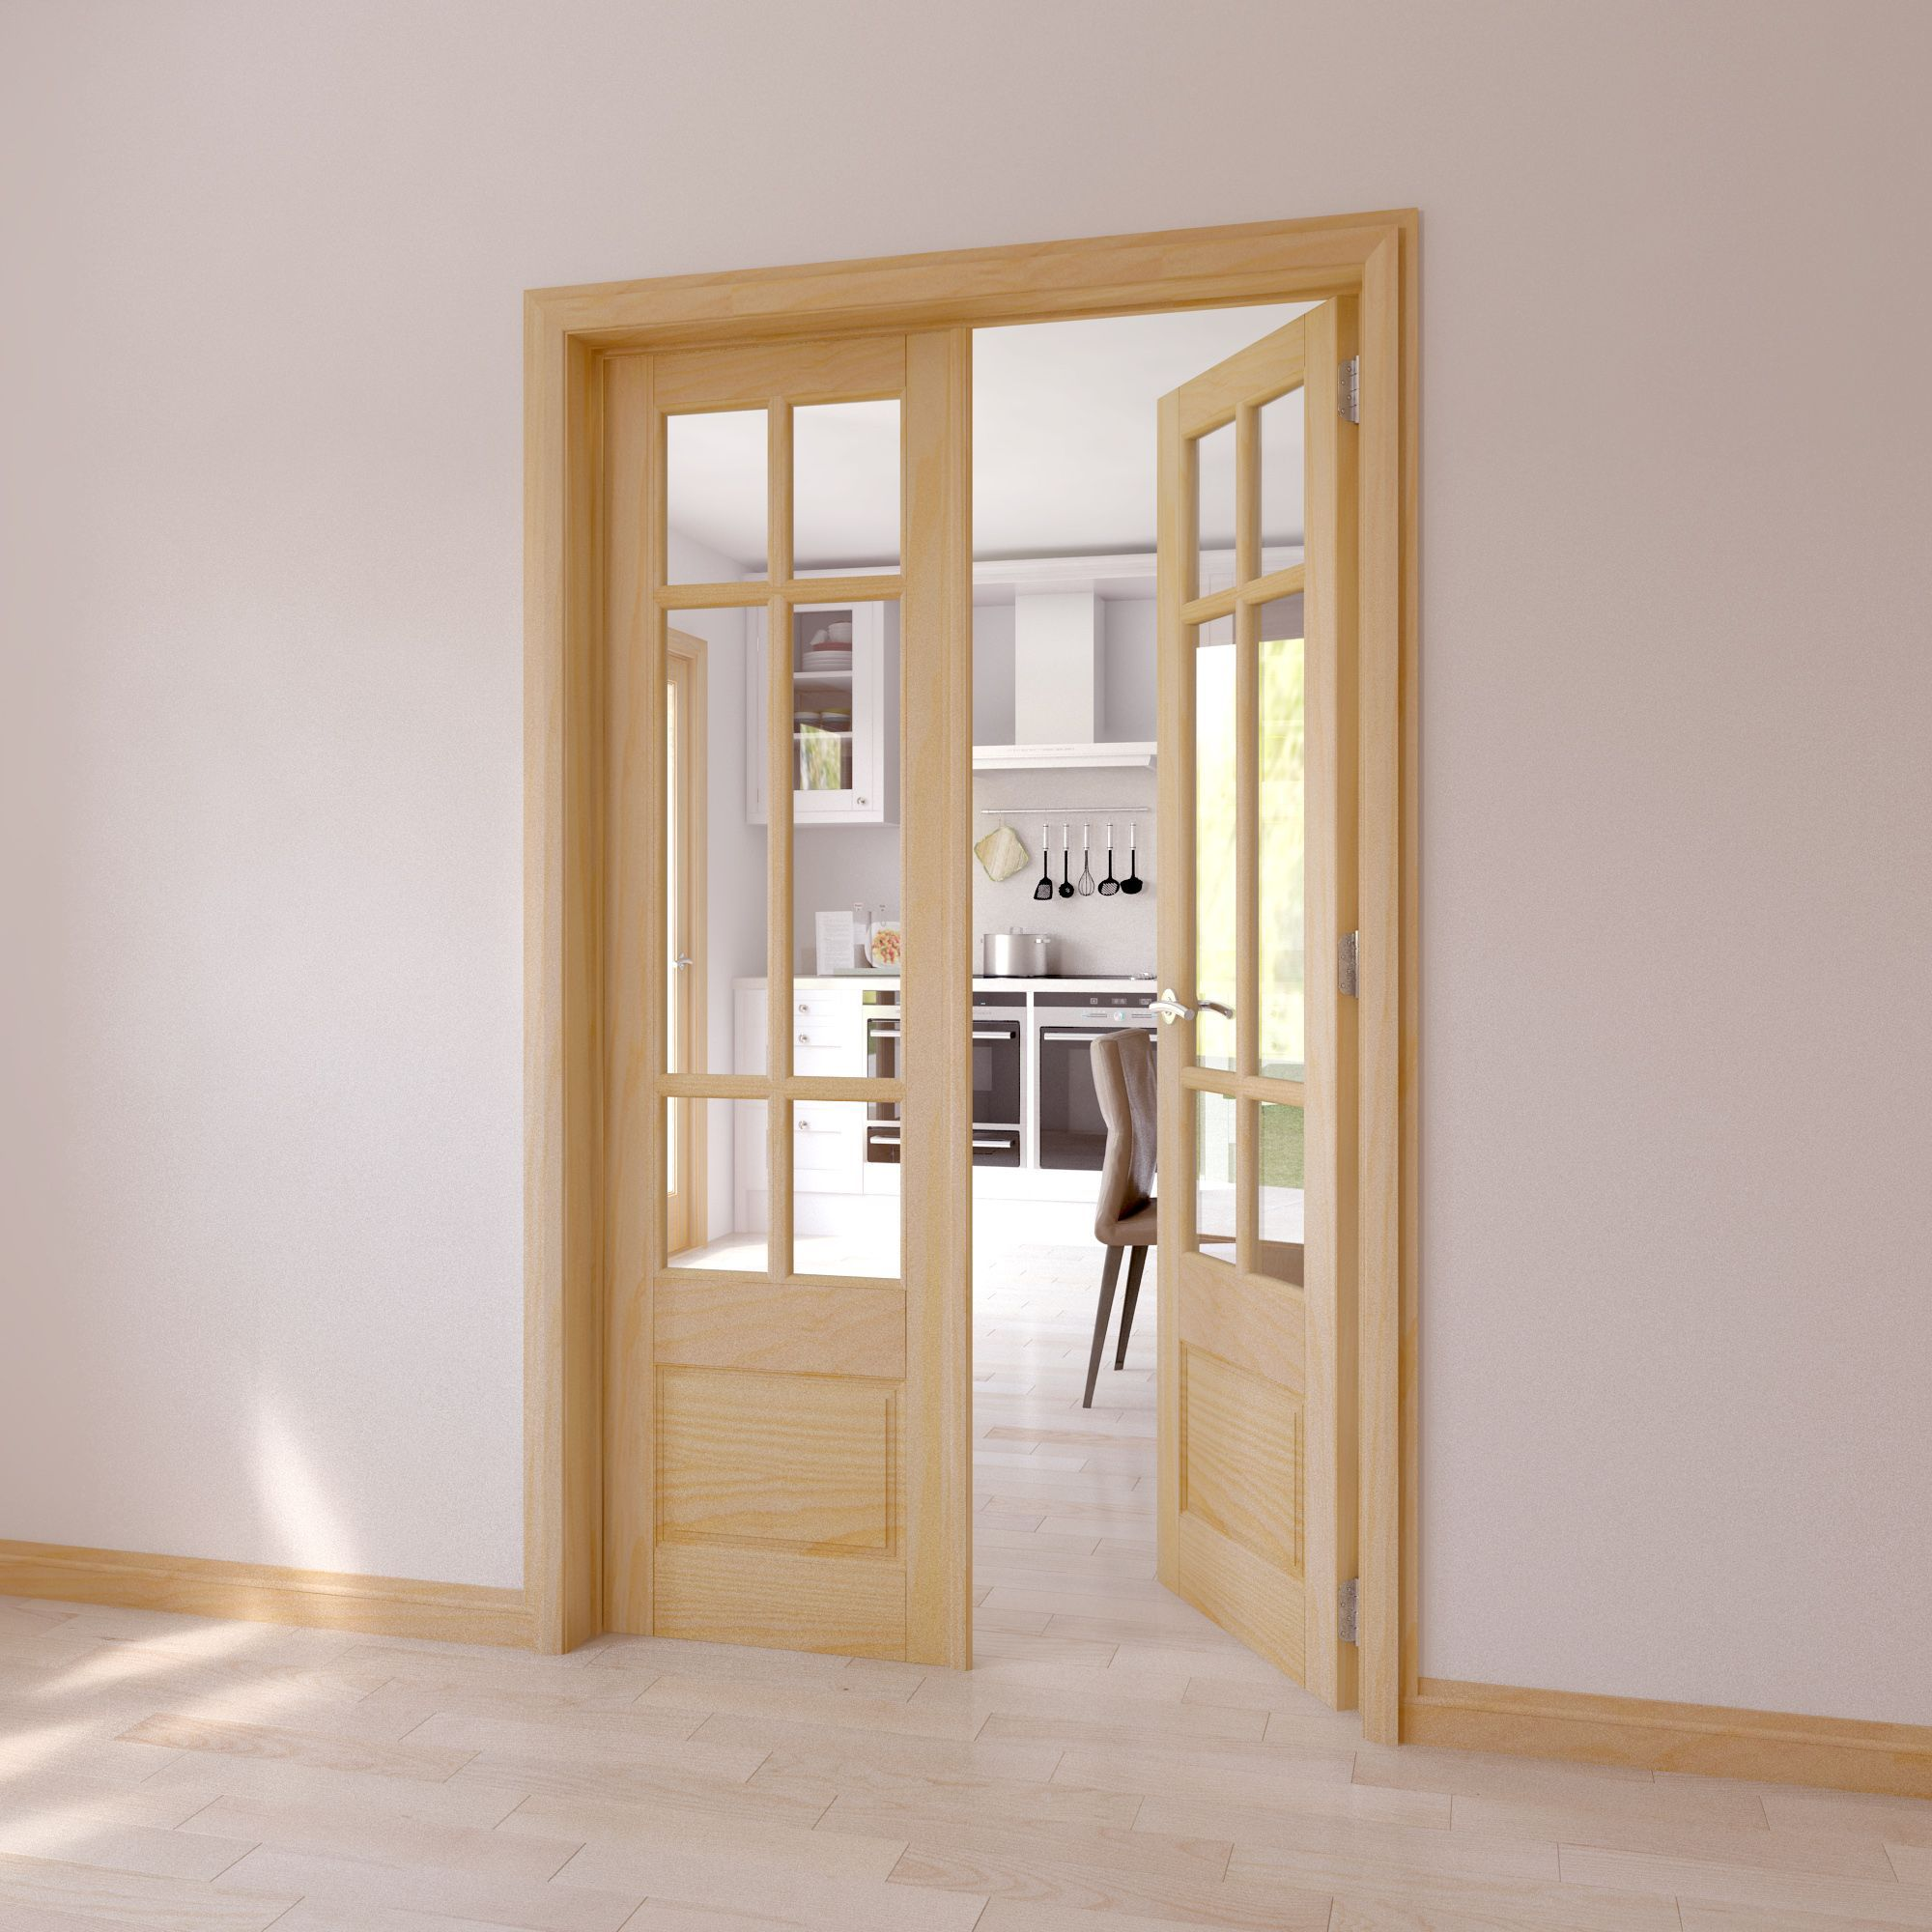 6 Lite Clear Glazed 2 Panel Internal French Door Set H1981mm W